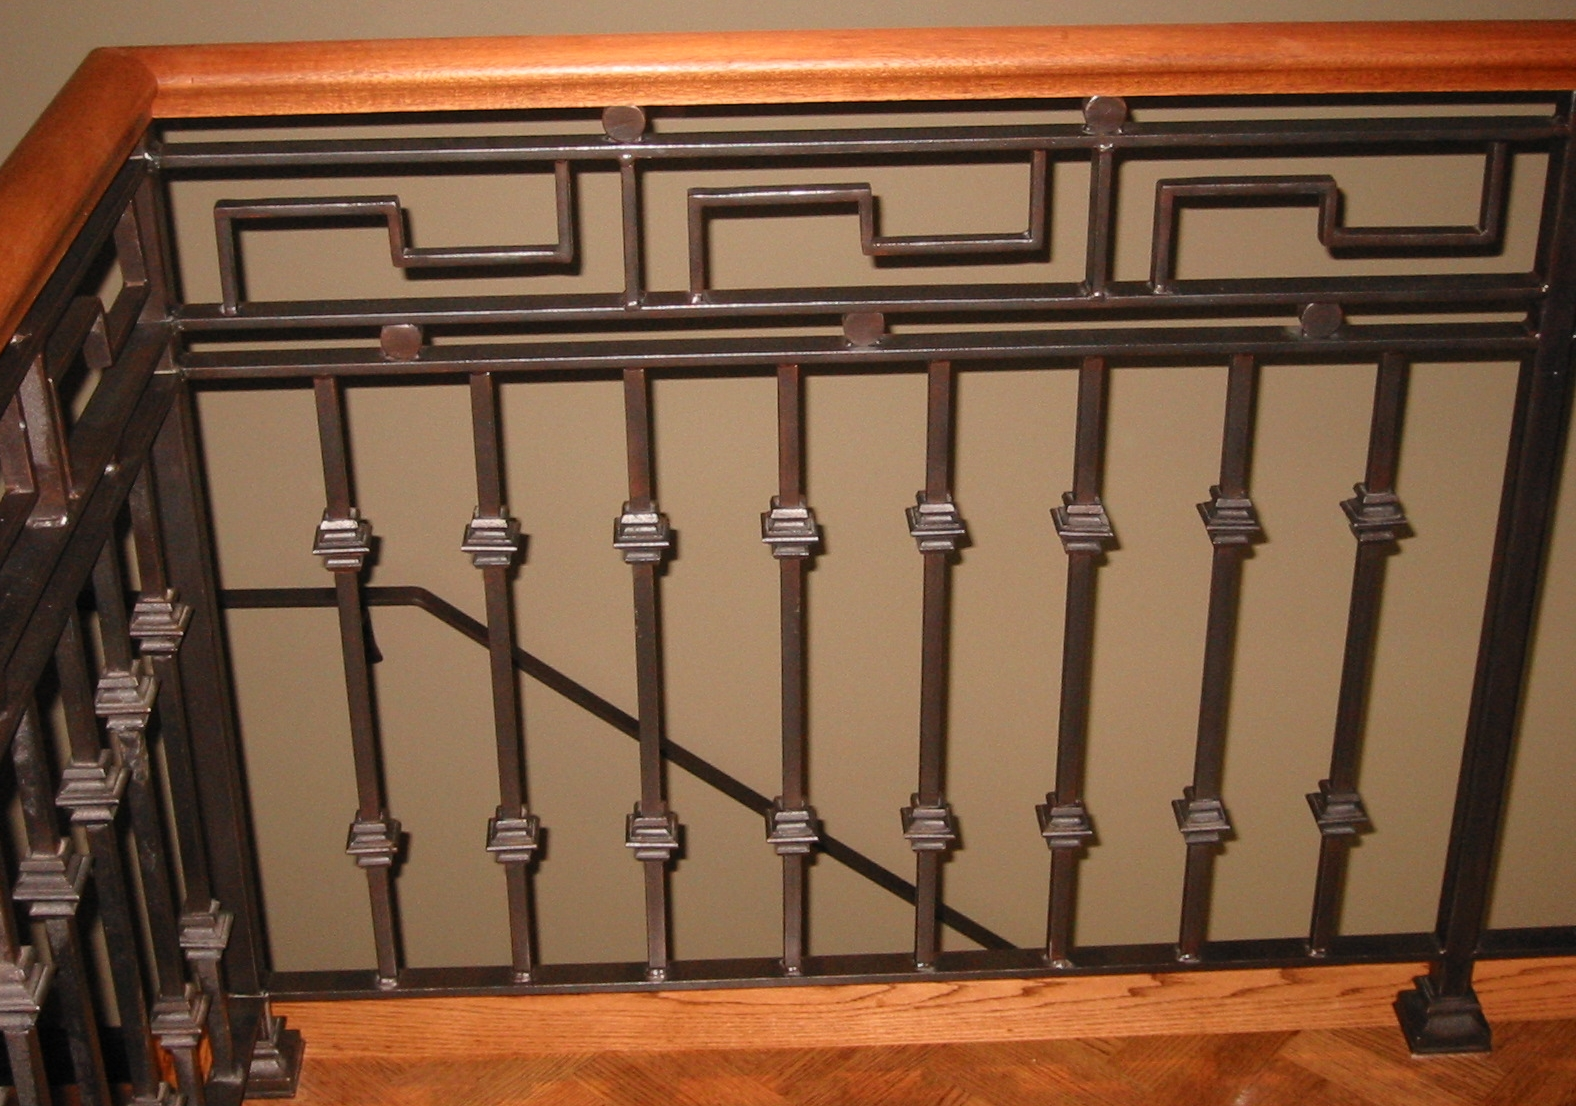 Greek Motif Interior Balcony Rail